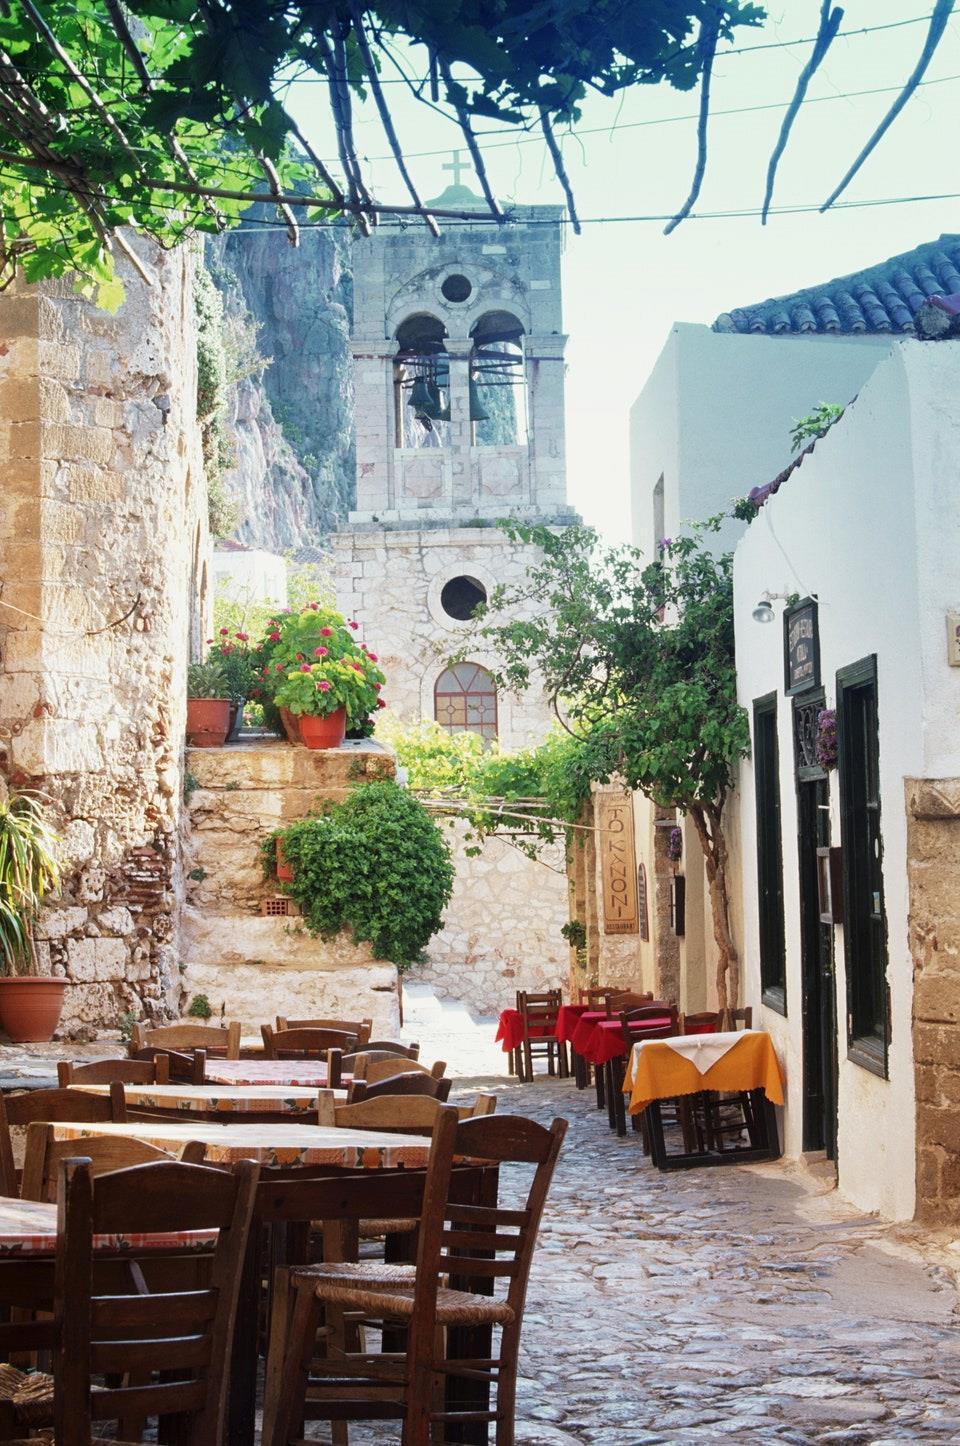 Aegina, Poros and Hydra Excursion